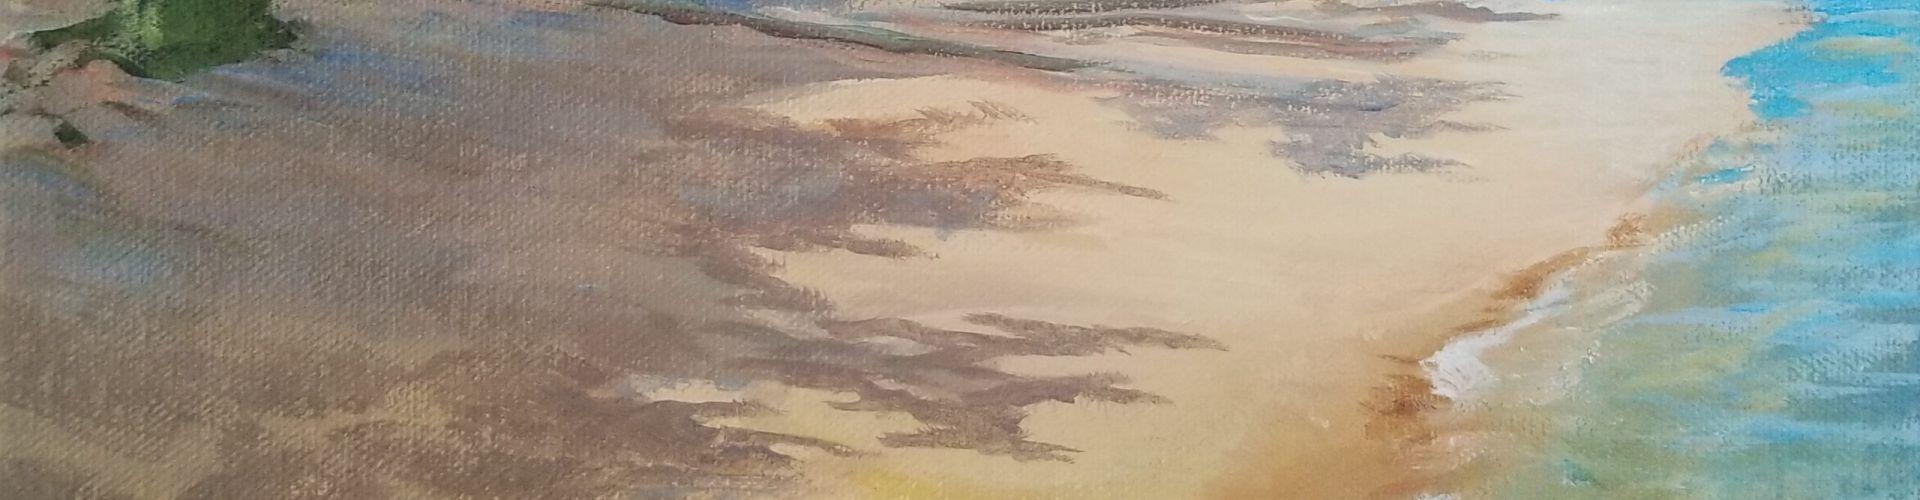 Slocan Lake Beach painting by Linda Lovisa